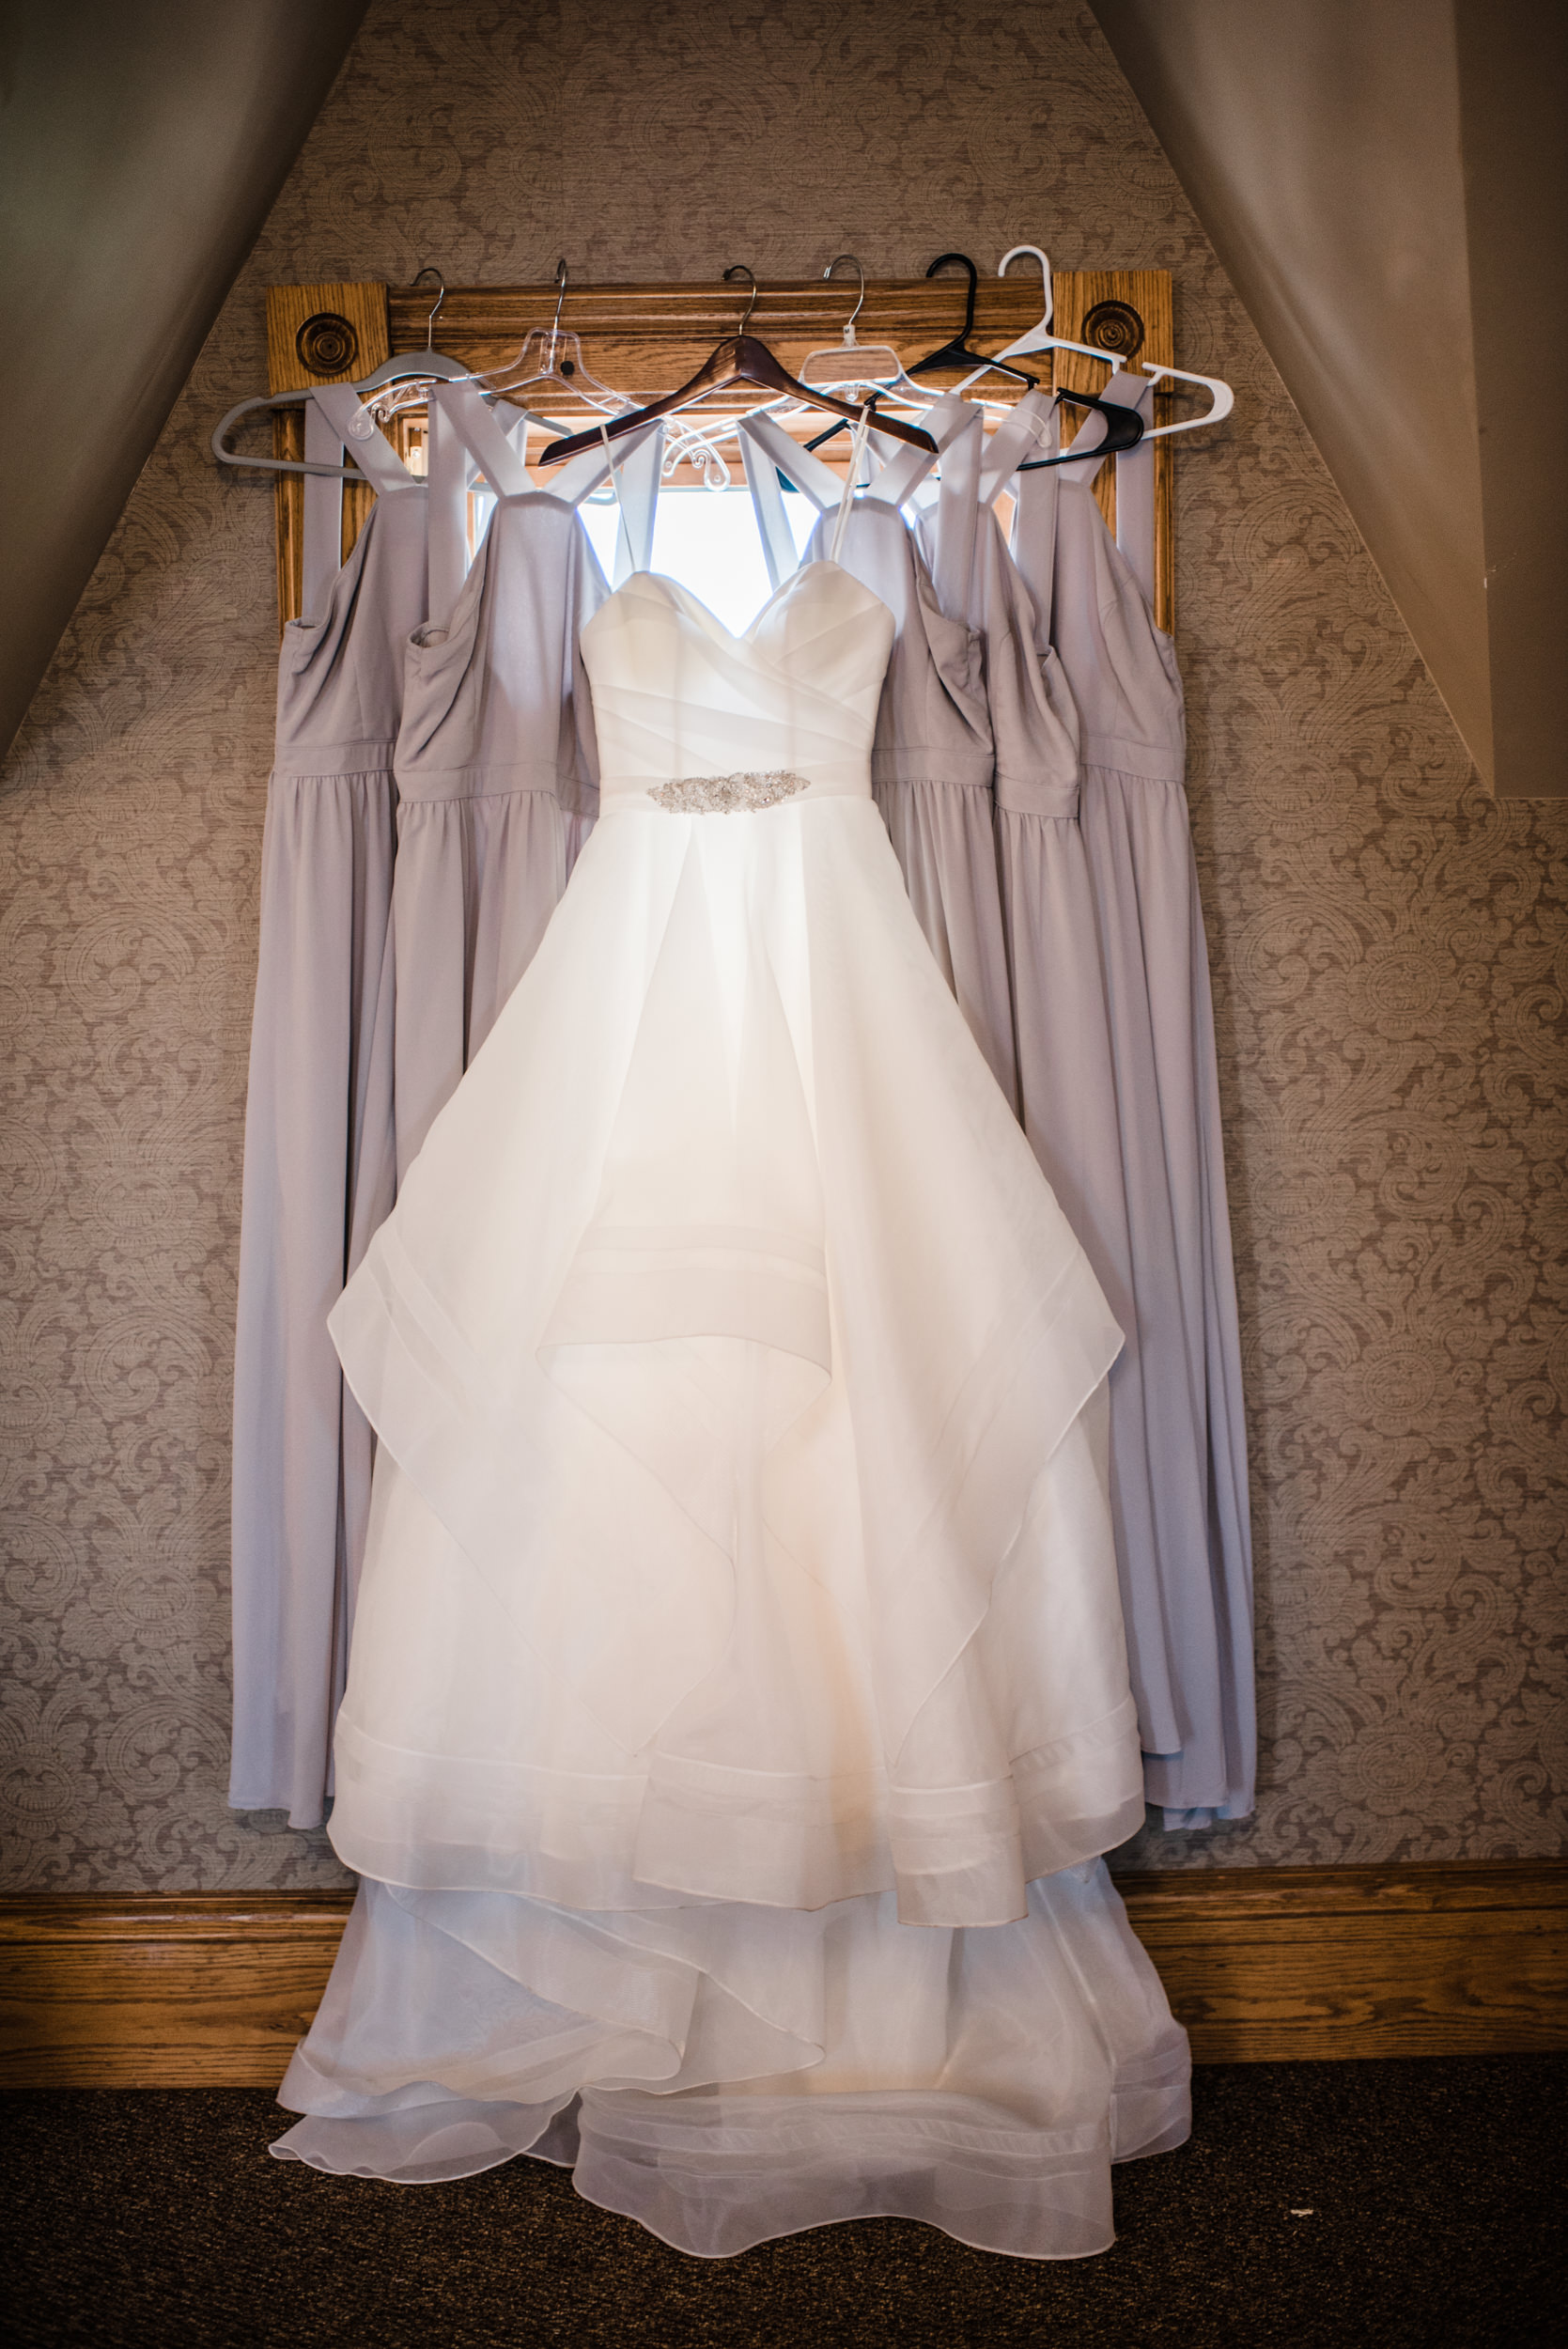 Colorado mountain wedding photographer at Brookeside Gardens showing wedding dresses and bridesmaid dresses.